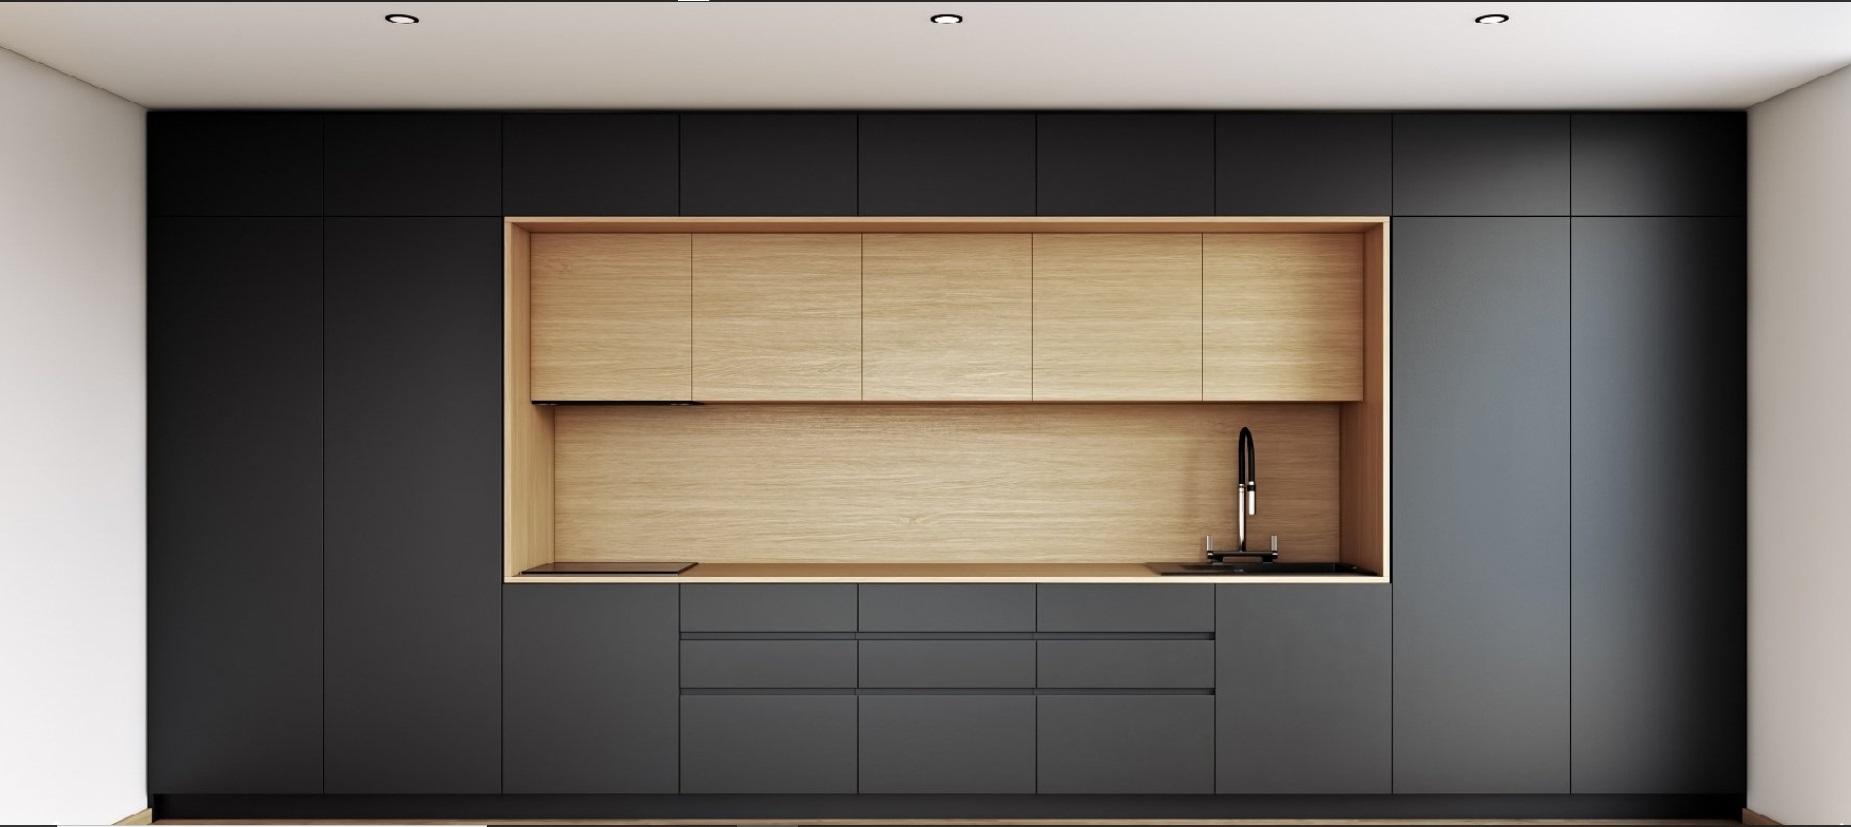 Fenix Laminates Bespoke Kitchen Furniture